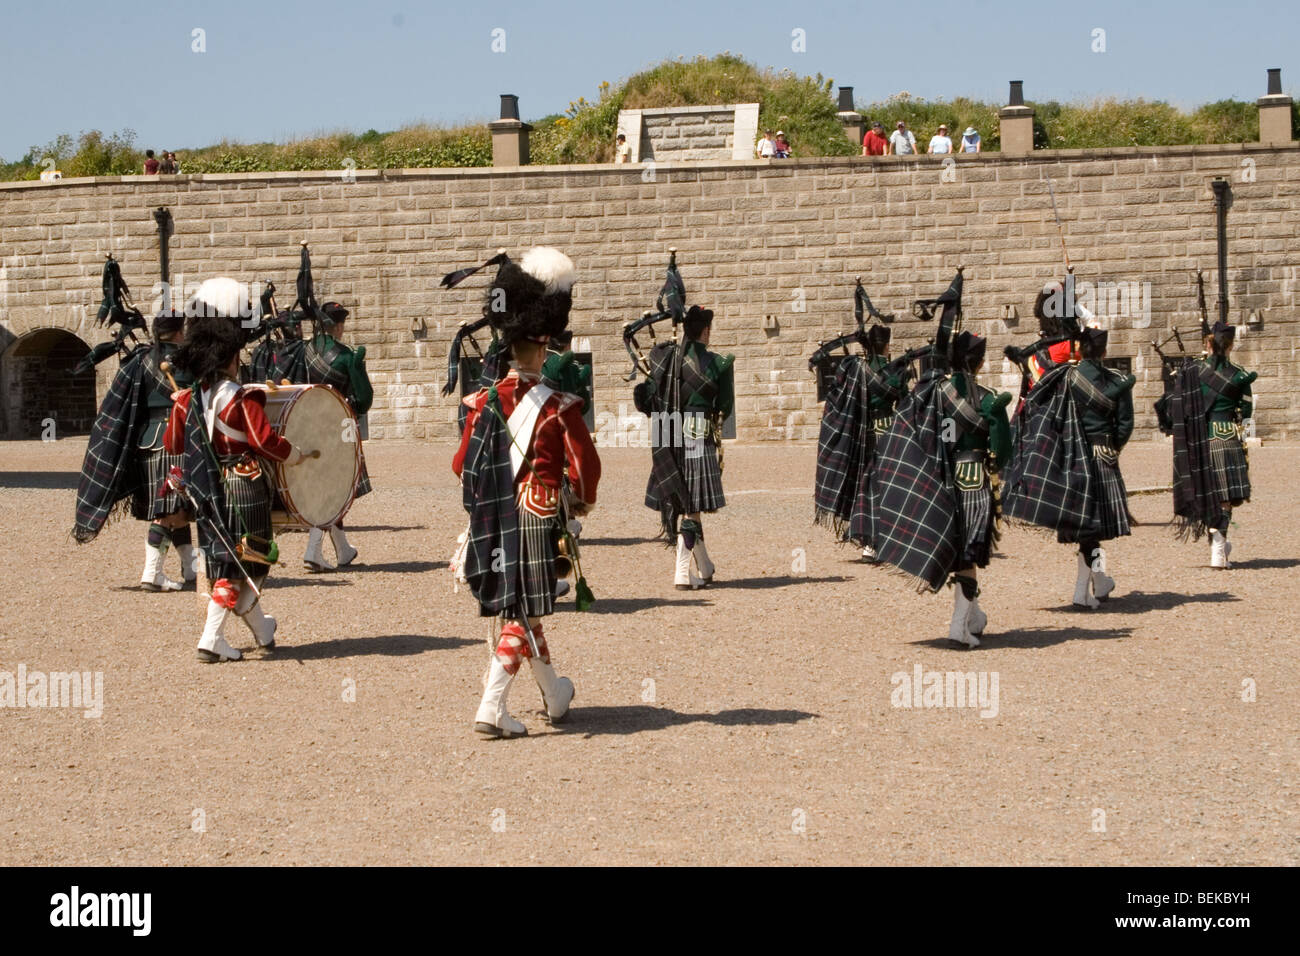 Scottish Guardsmen march at high noon at the Citadel Fortress in Halifax, Nova Scotia, UK. - Stock Image